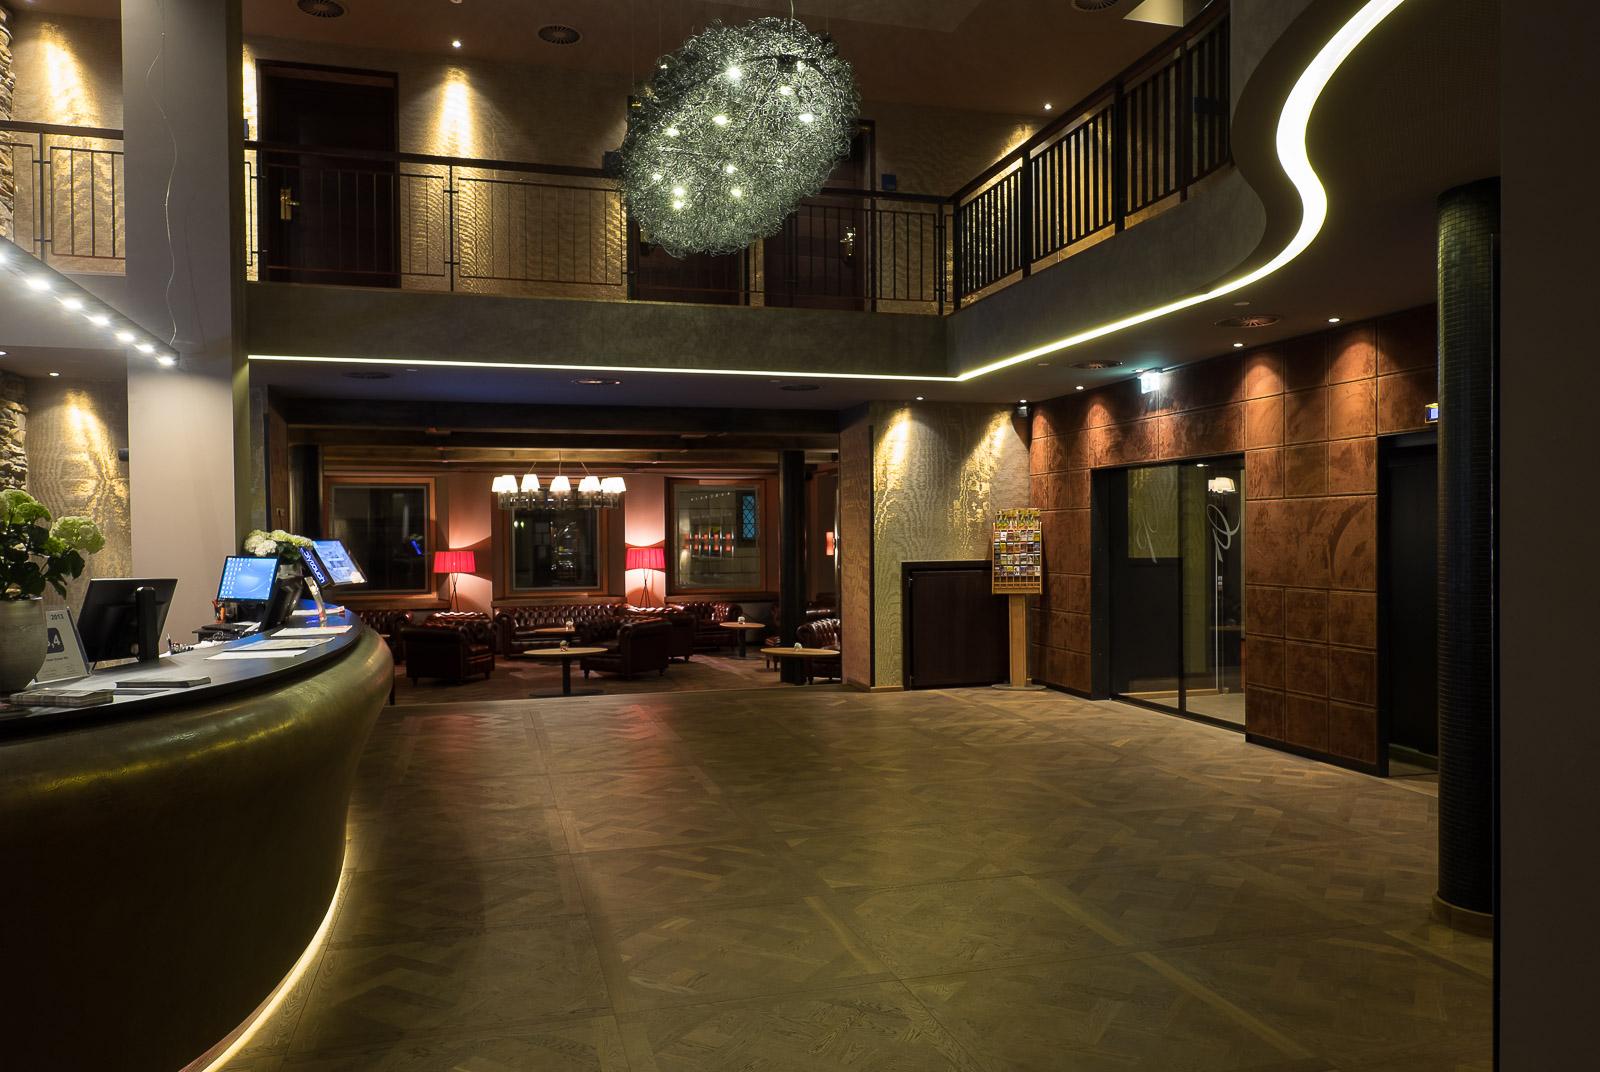 Hotel grauer b r innsbruck pro vision media for Designhotel innsbruck